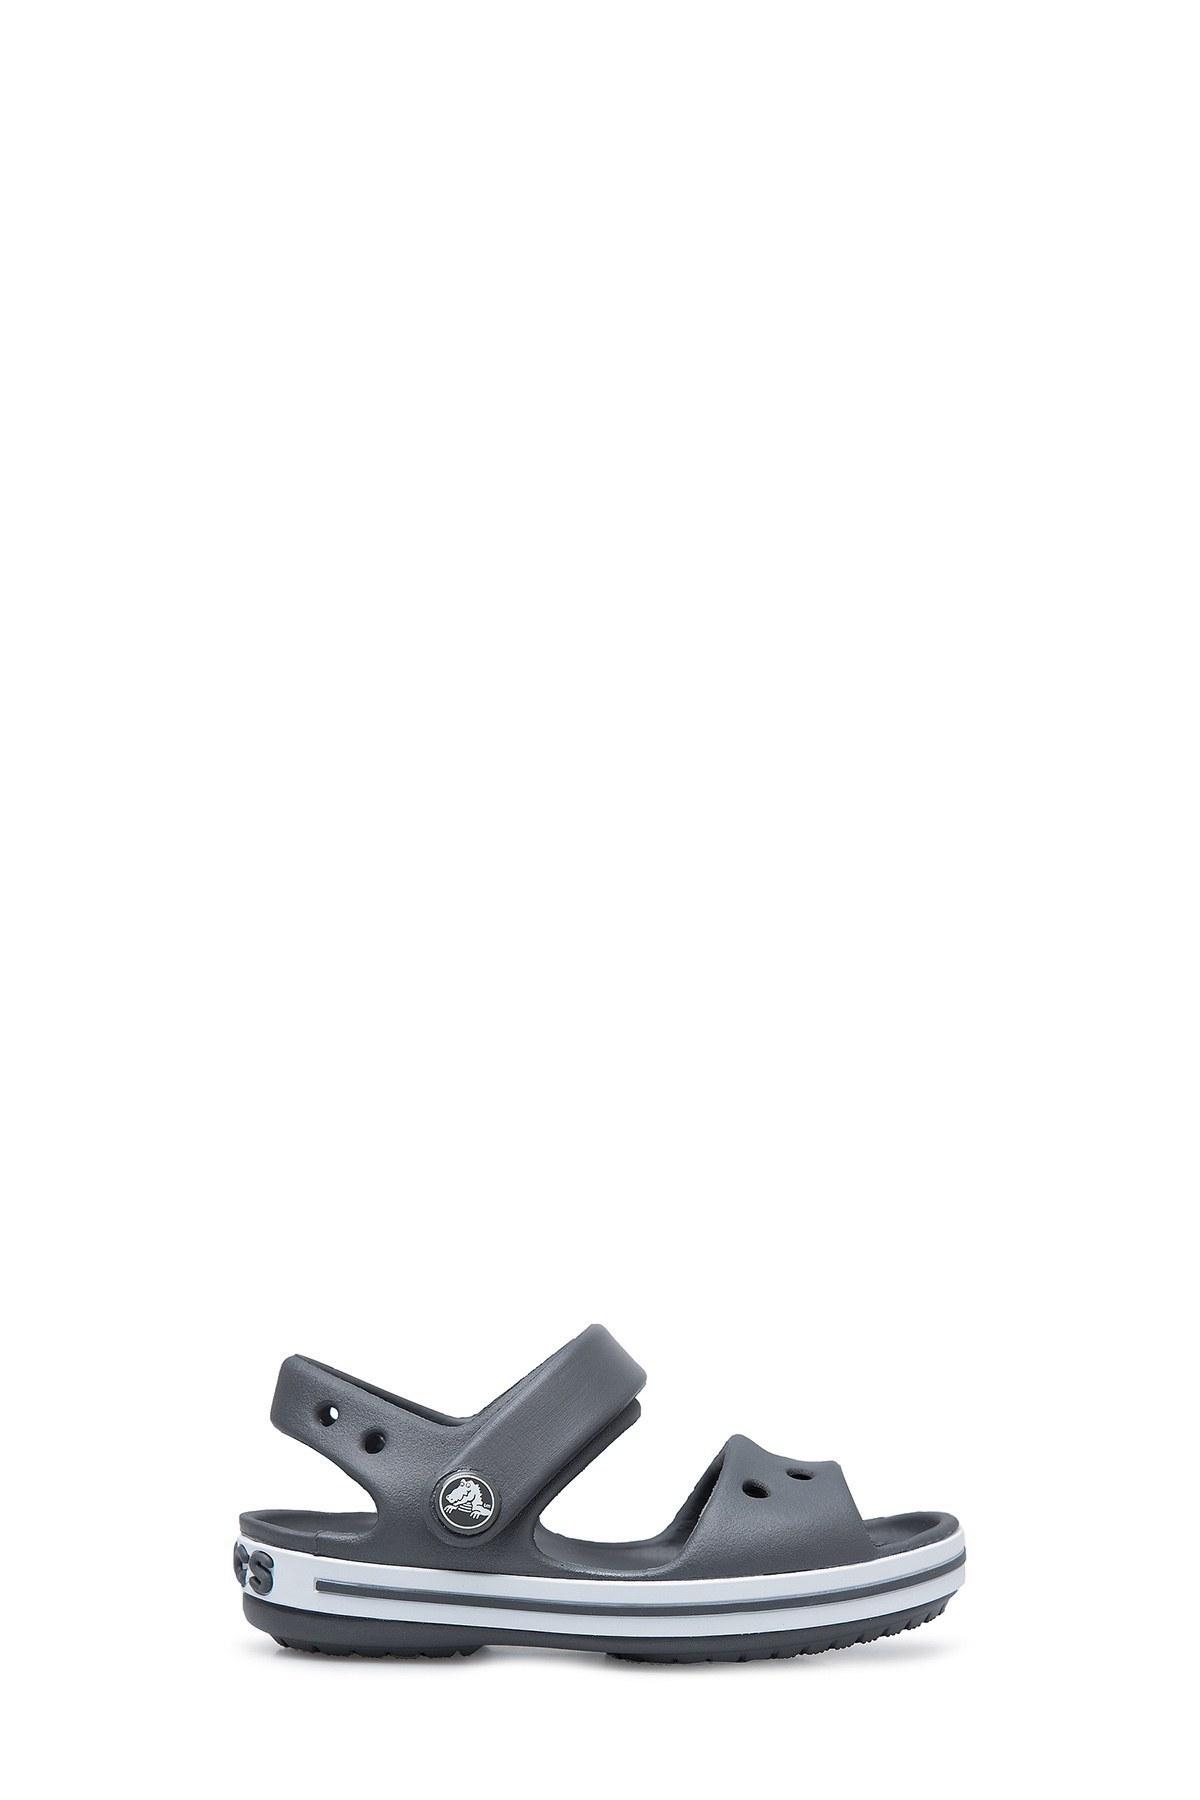 Crocs Crocband Unisex Sandalet 12856-014 FÜME